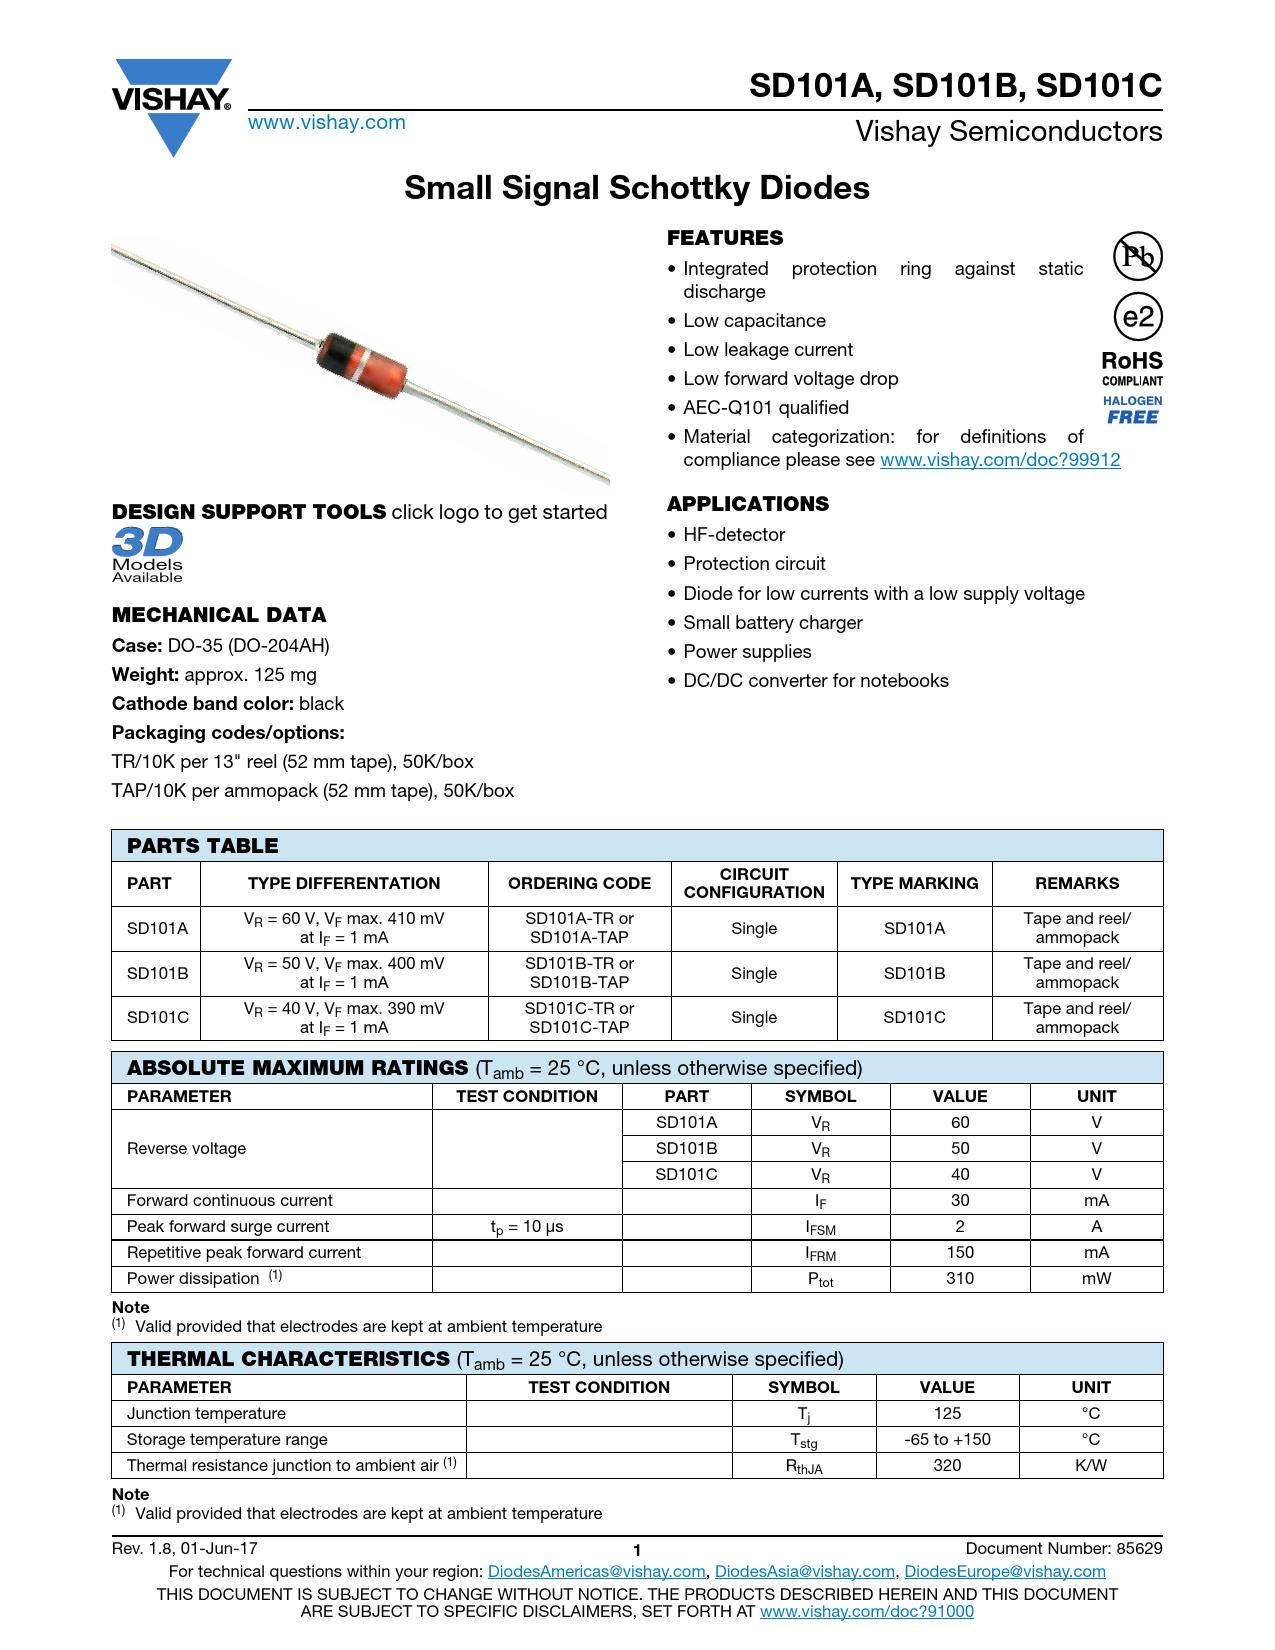 Datasheet SD101A Vishay